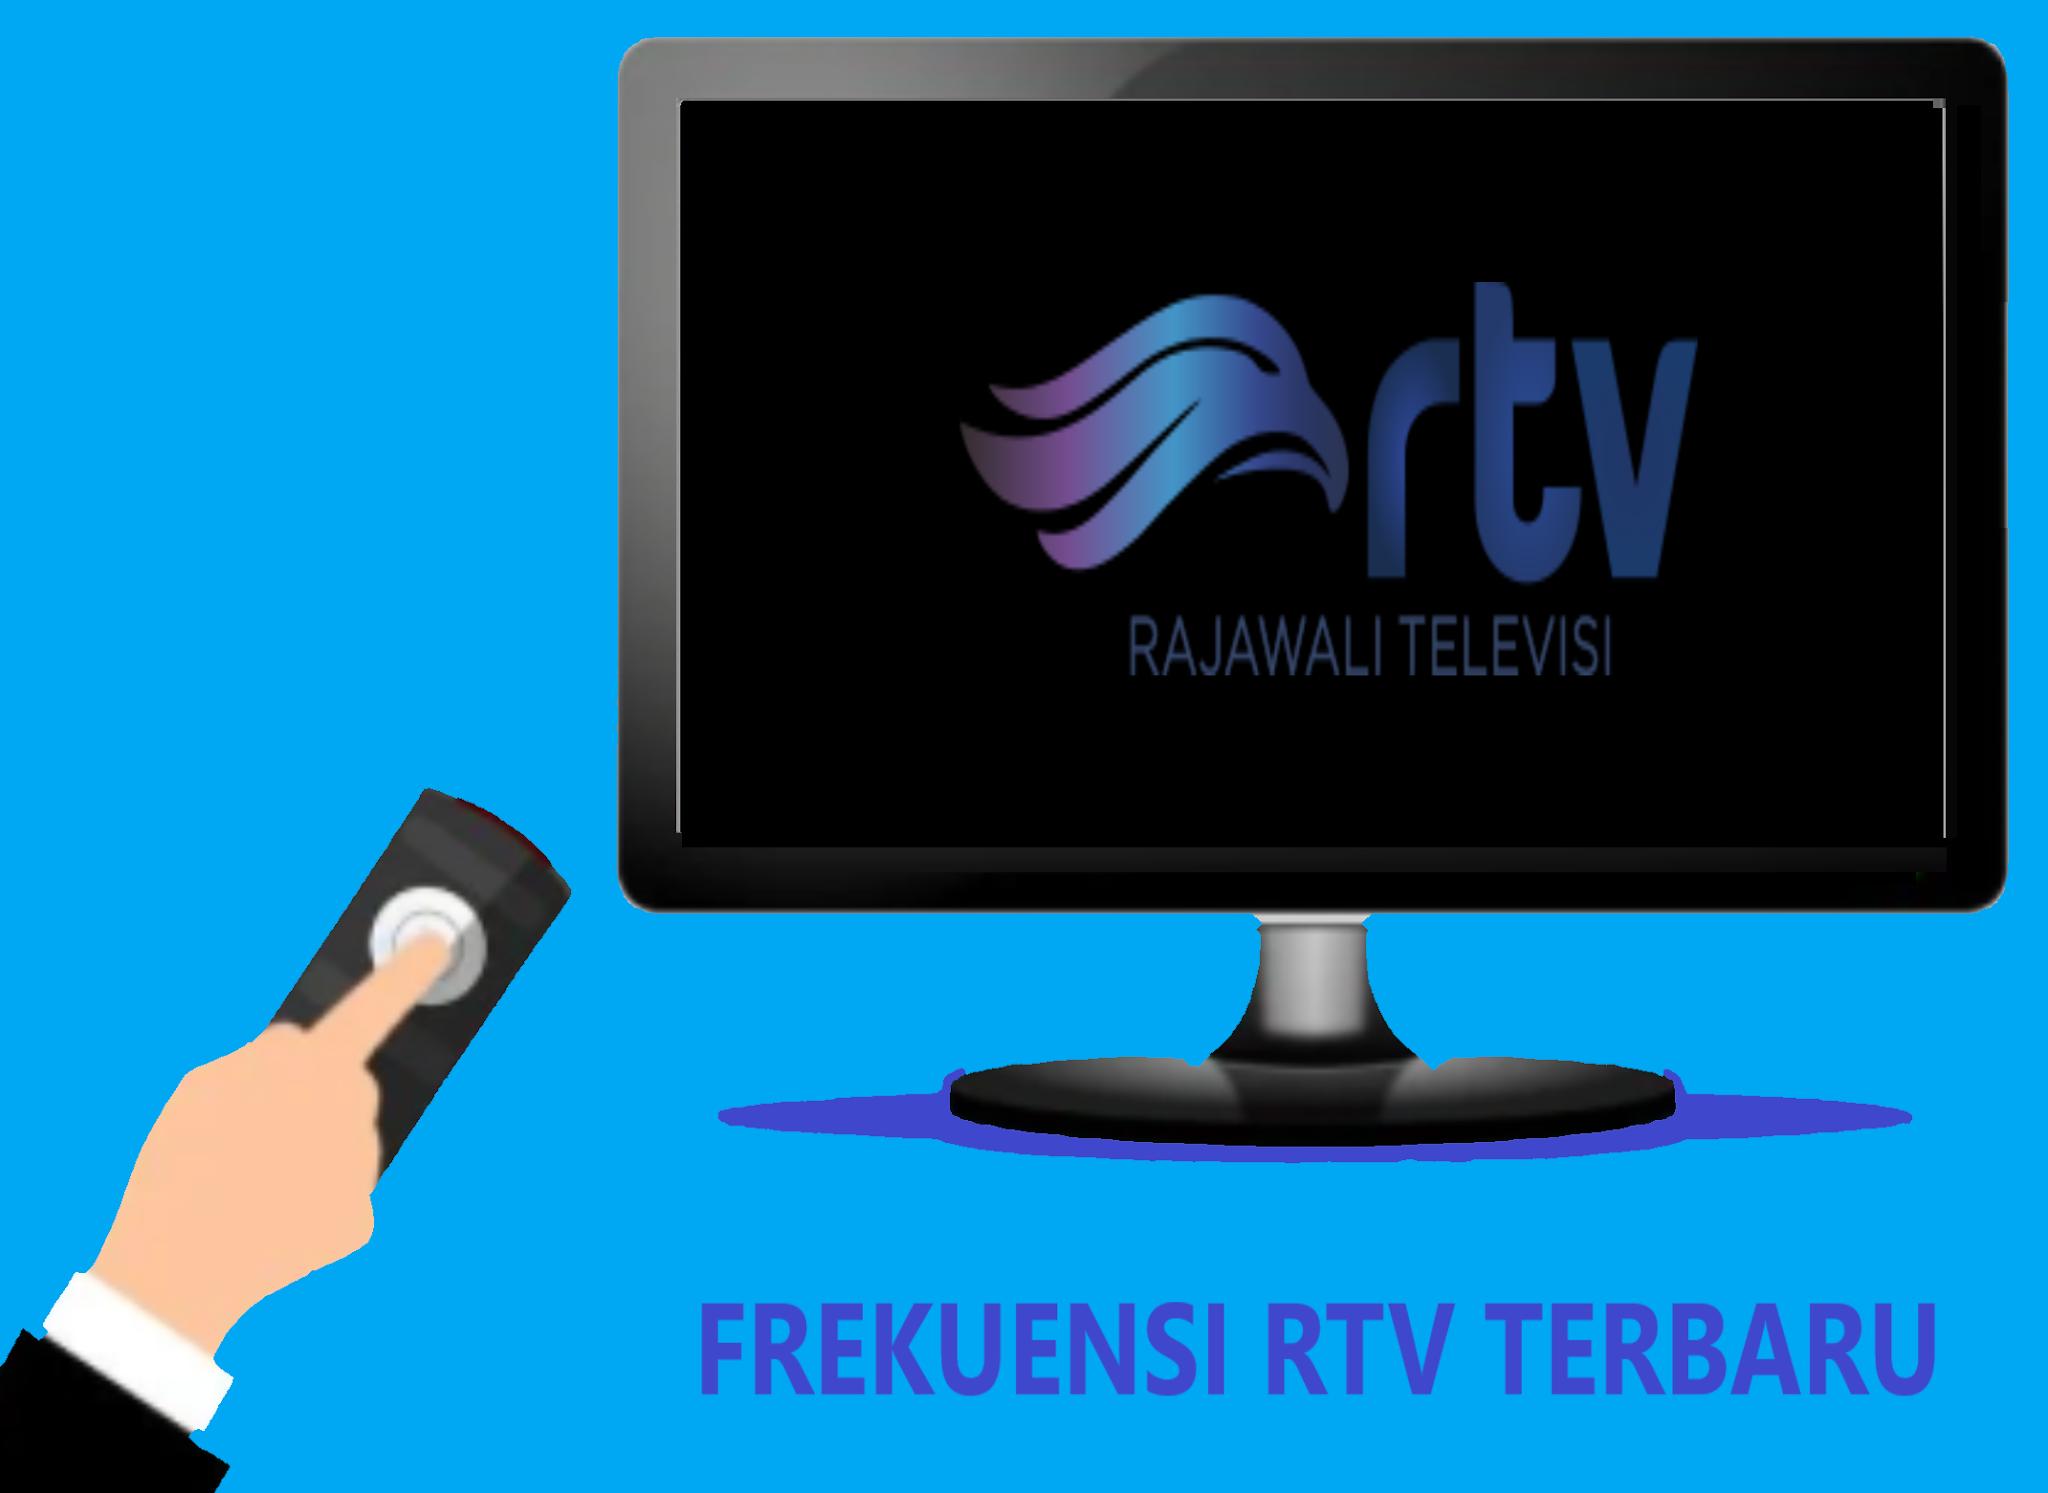 Frekuensi RTV Terbaru Di Telkom 4 Update 2020 (Rajawali TV)